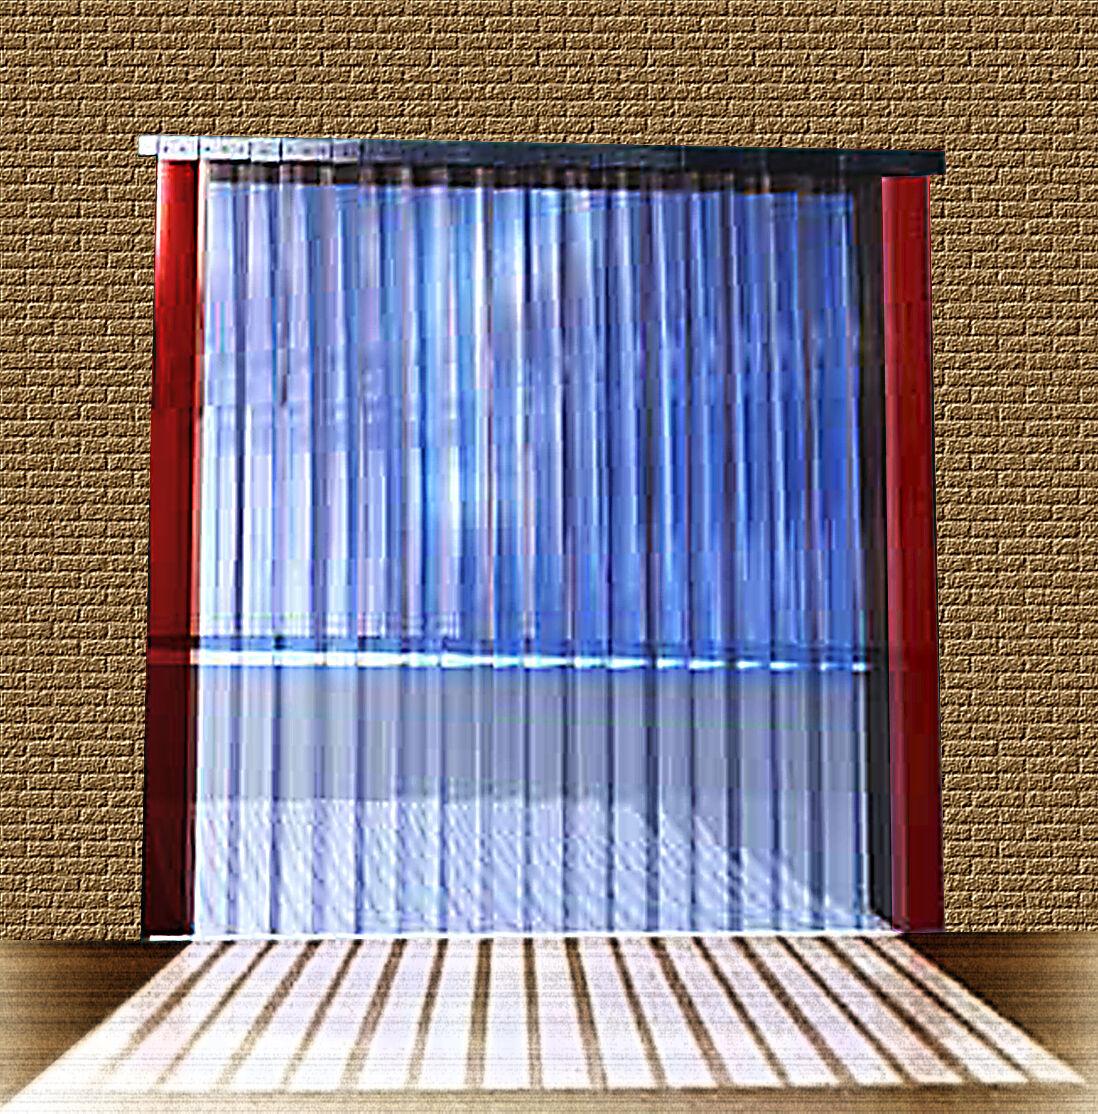 B 3,50m x H2,25m Lamellen PVC Streifen Vorhang 300x3mm